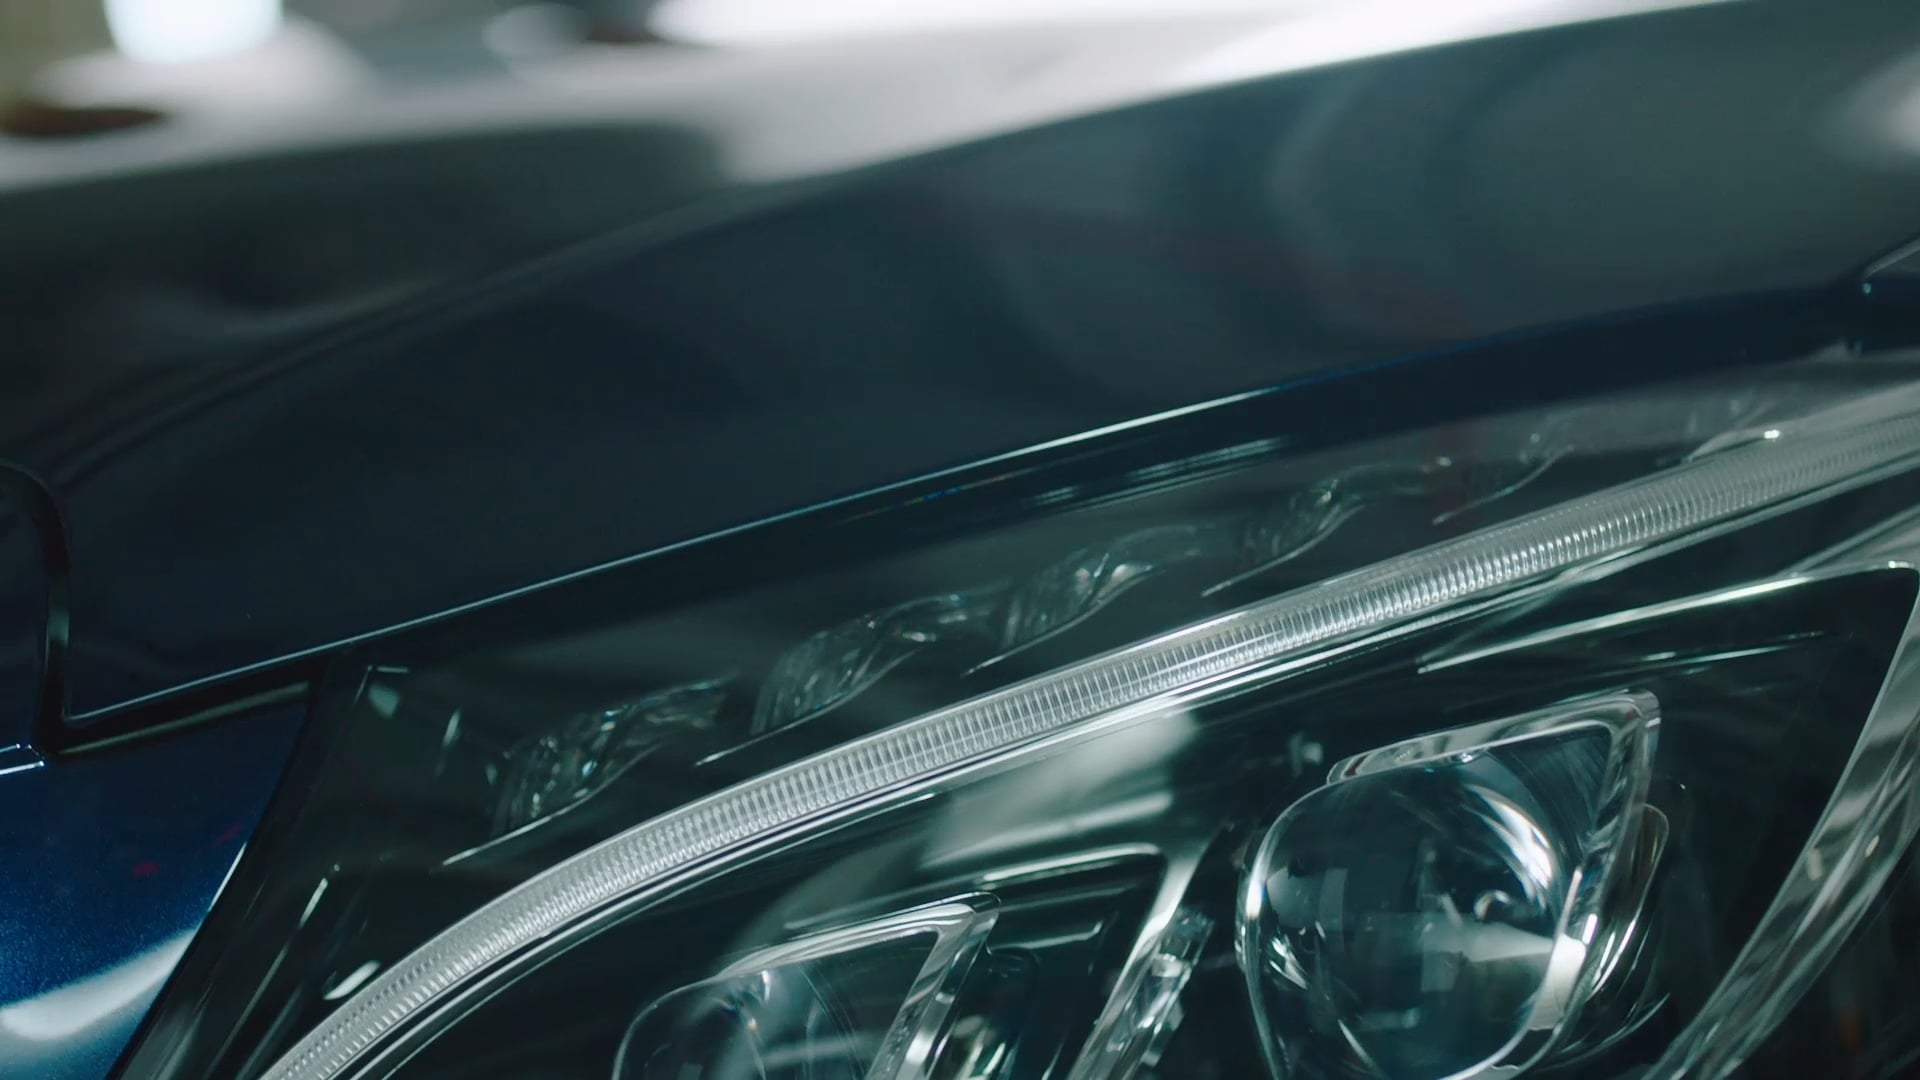 Daimler - Accident Management